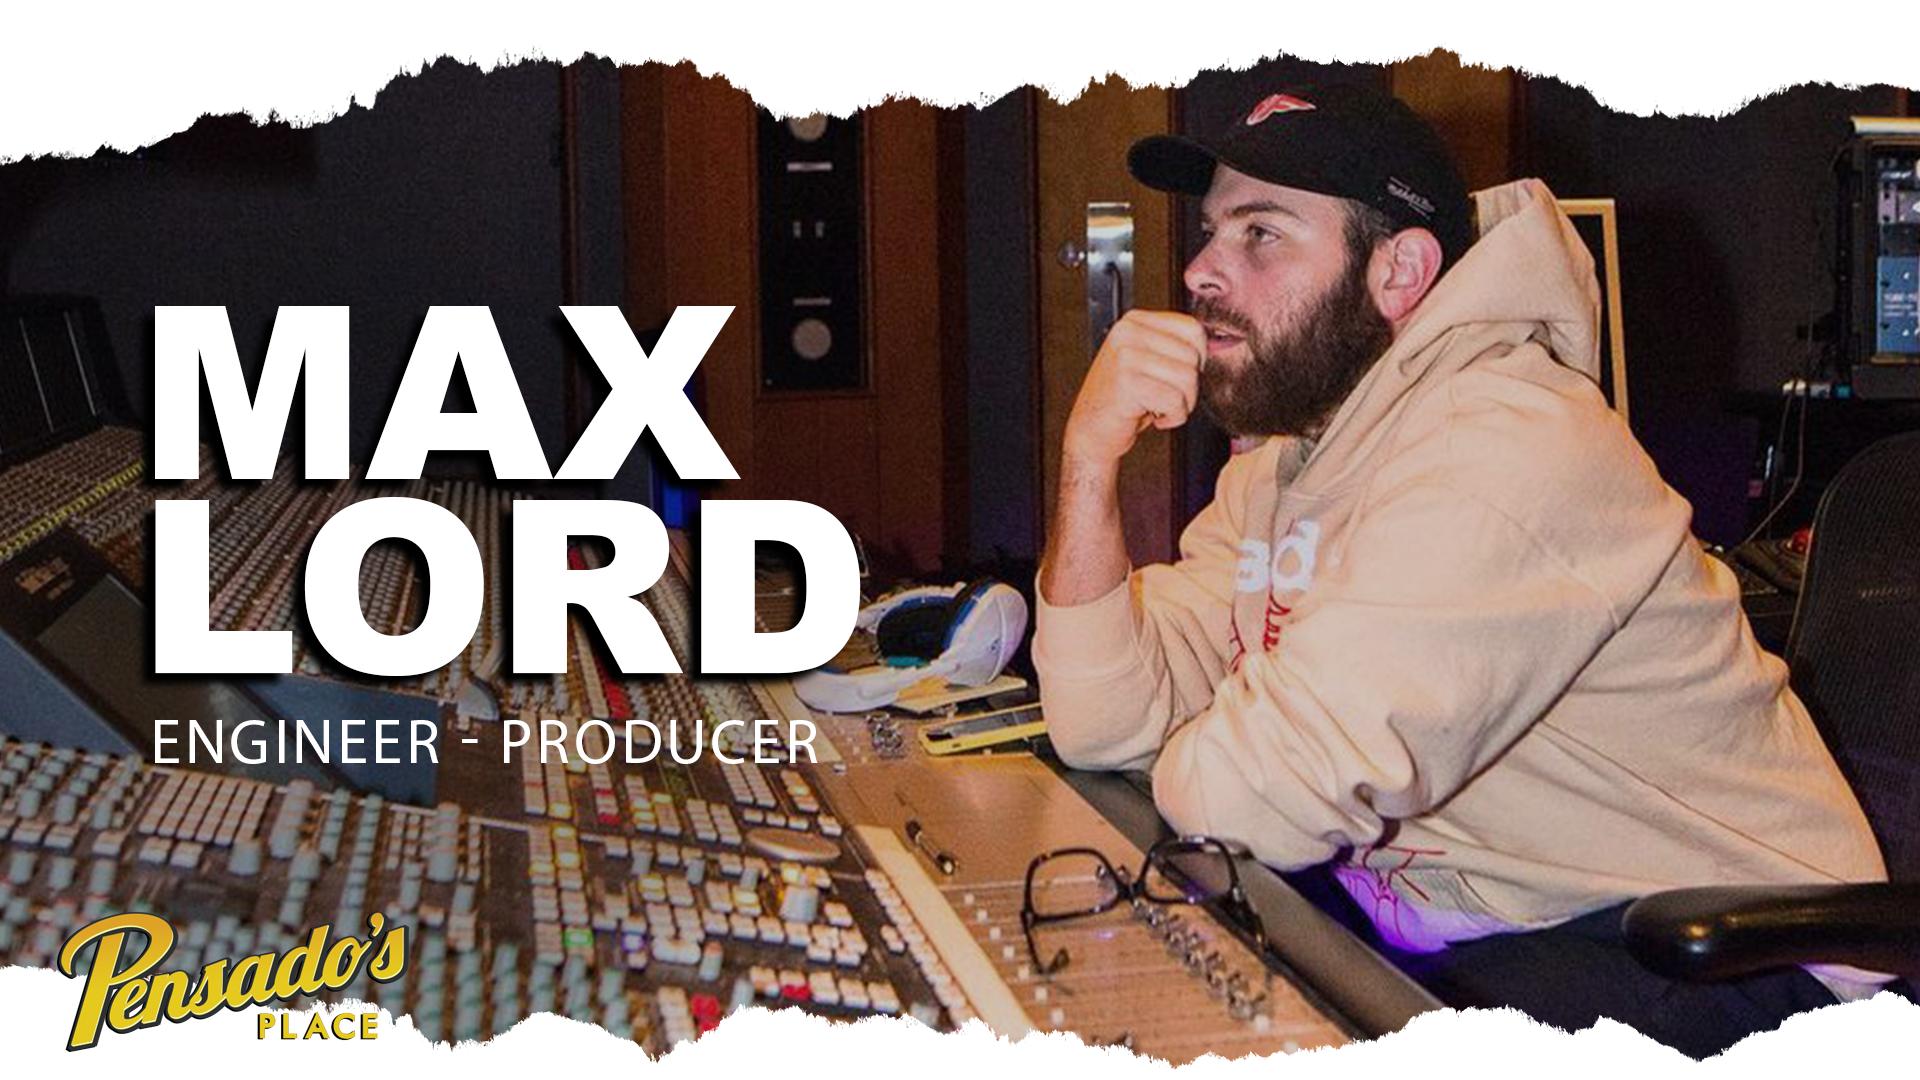 Juice WRLD Engineer / Producer, Max Lord